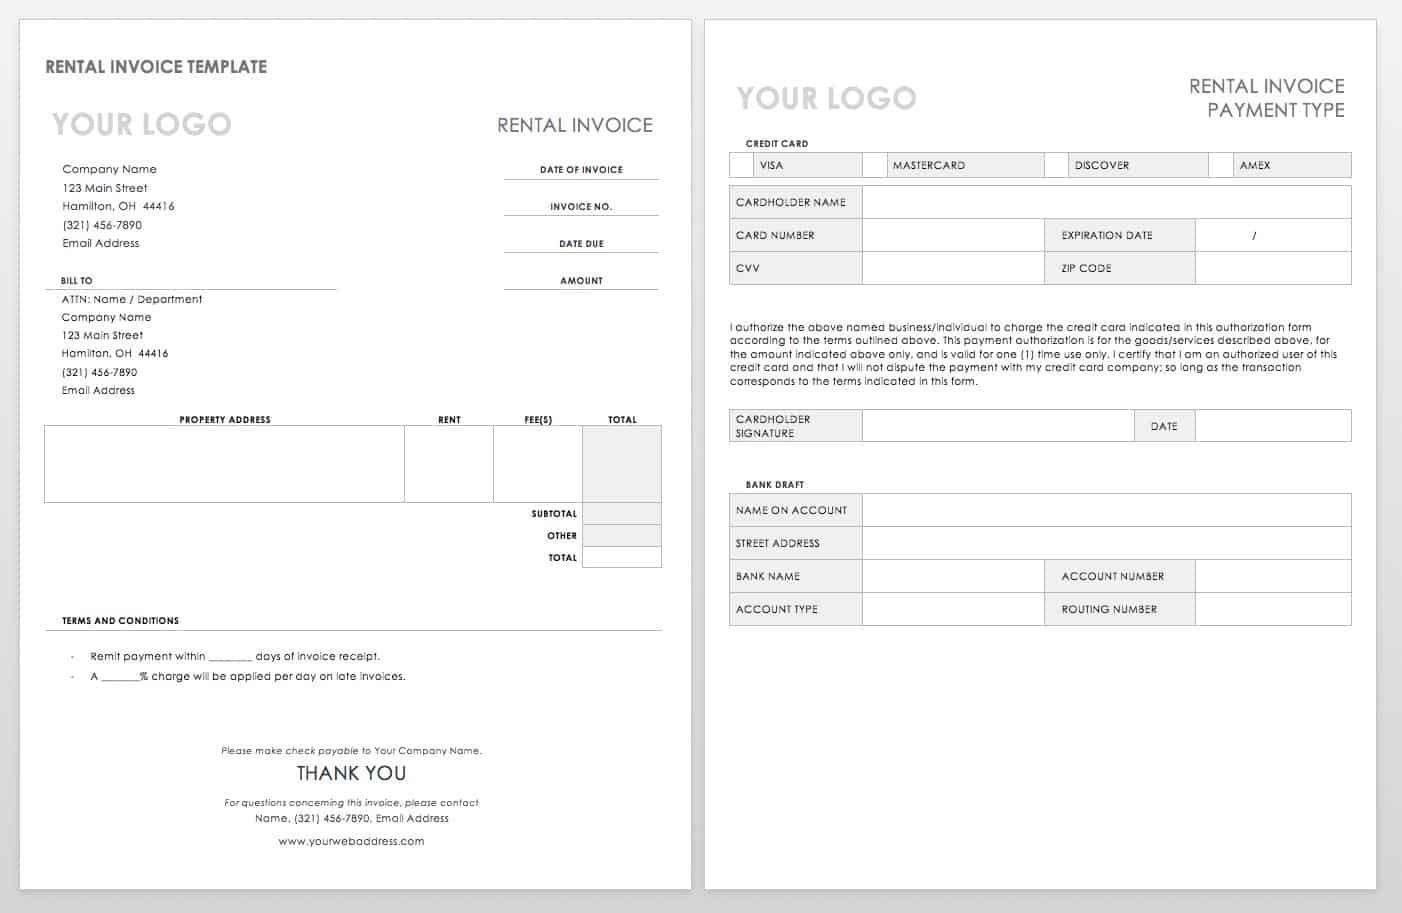 004 Surprising Professional Invoice Template Word Photo  Service MicrosoftFull